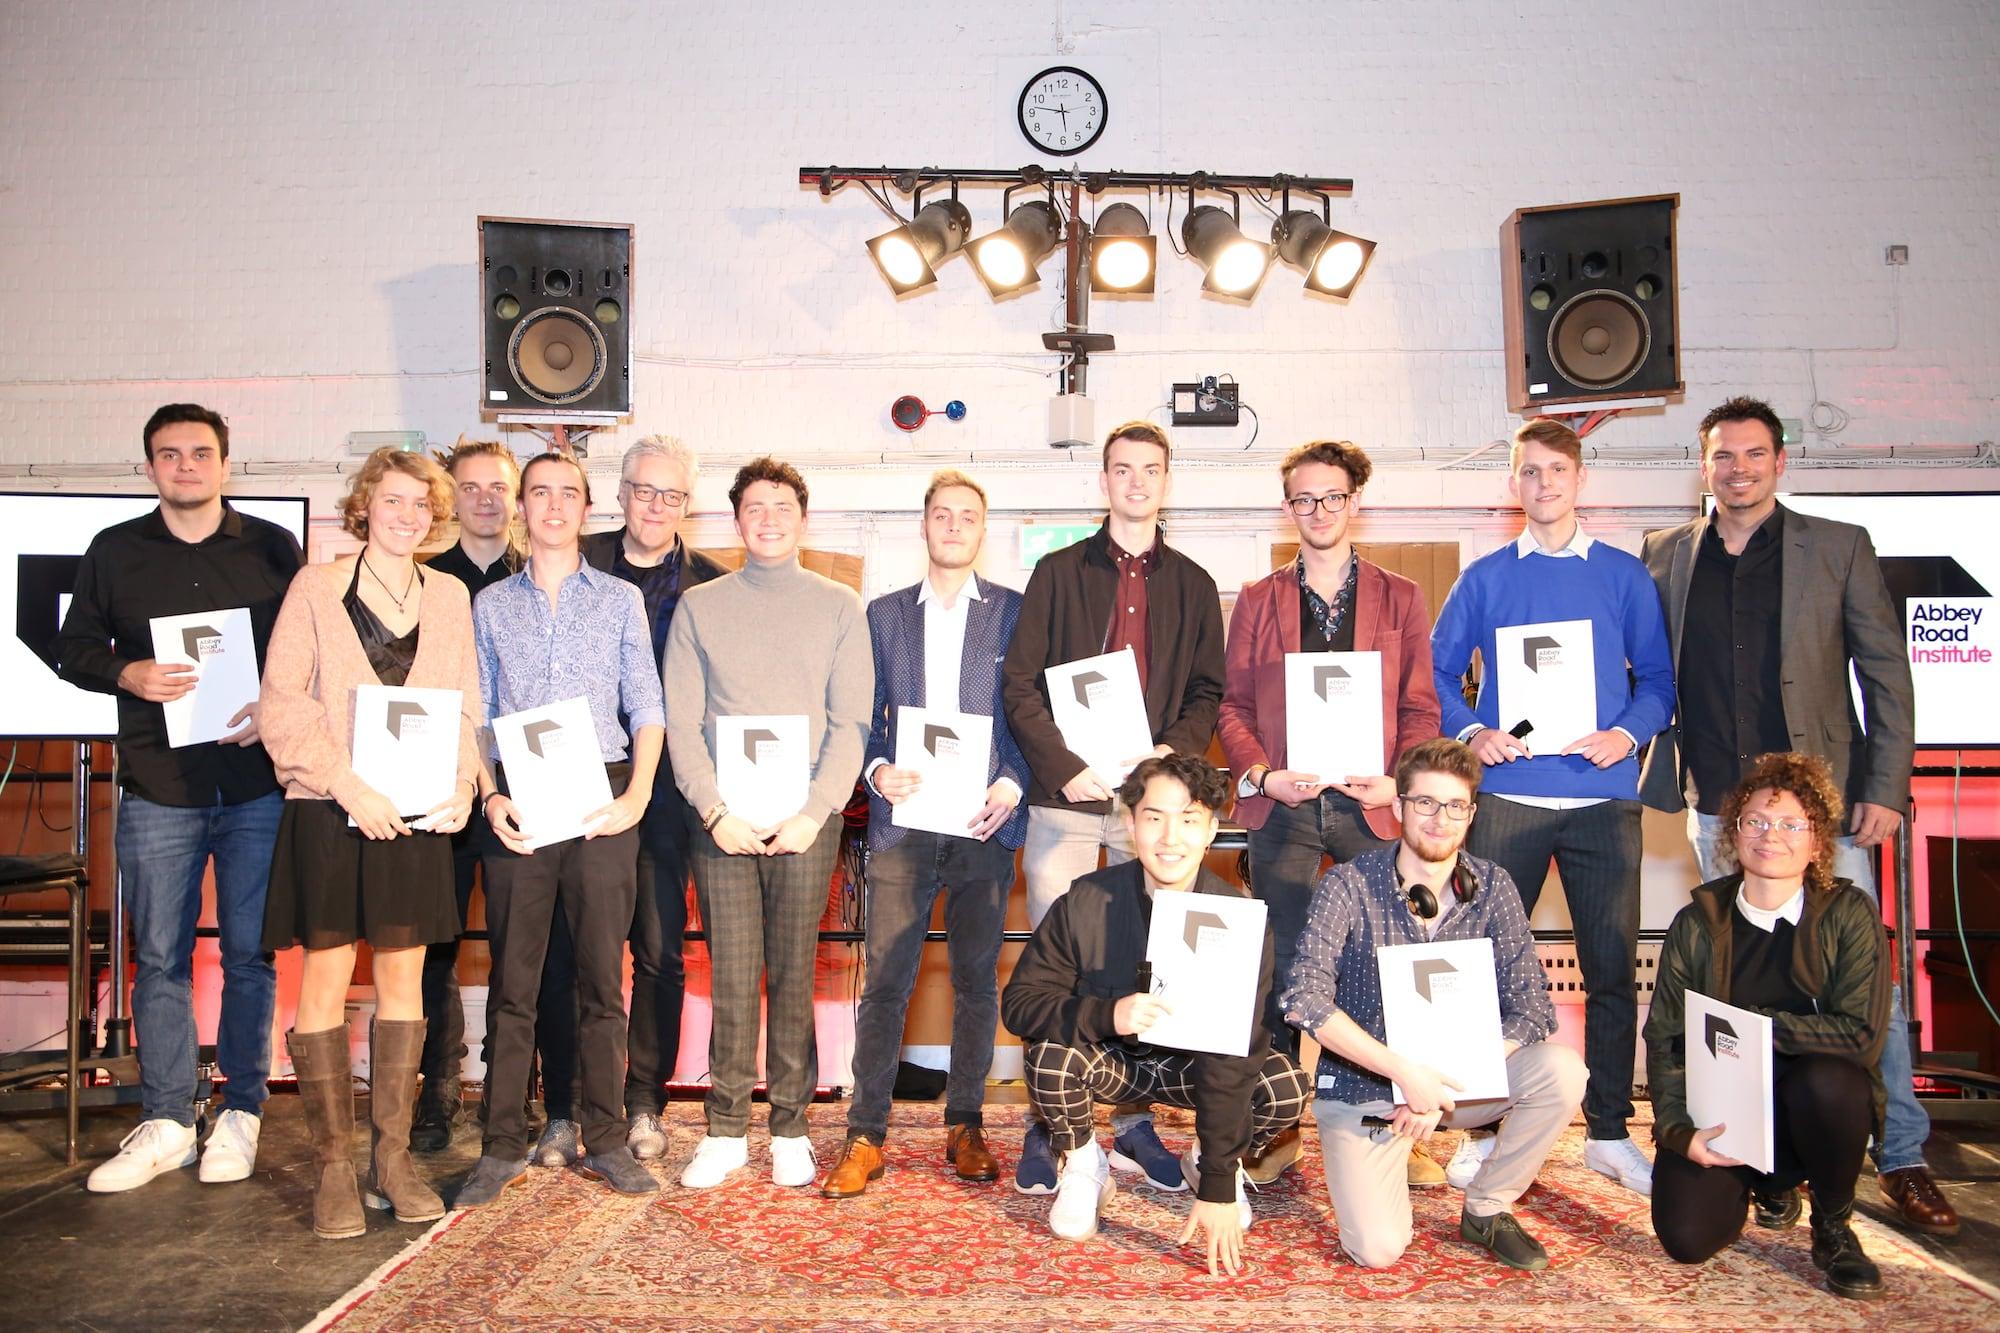 Gruppenbild der Abbey Road Institute Frankfurt Studenten in den Abbey Road Studios